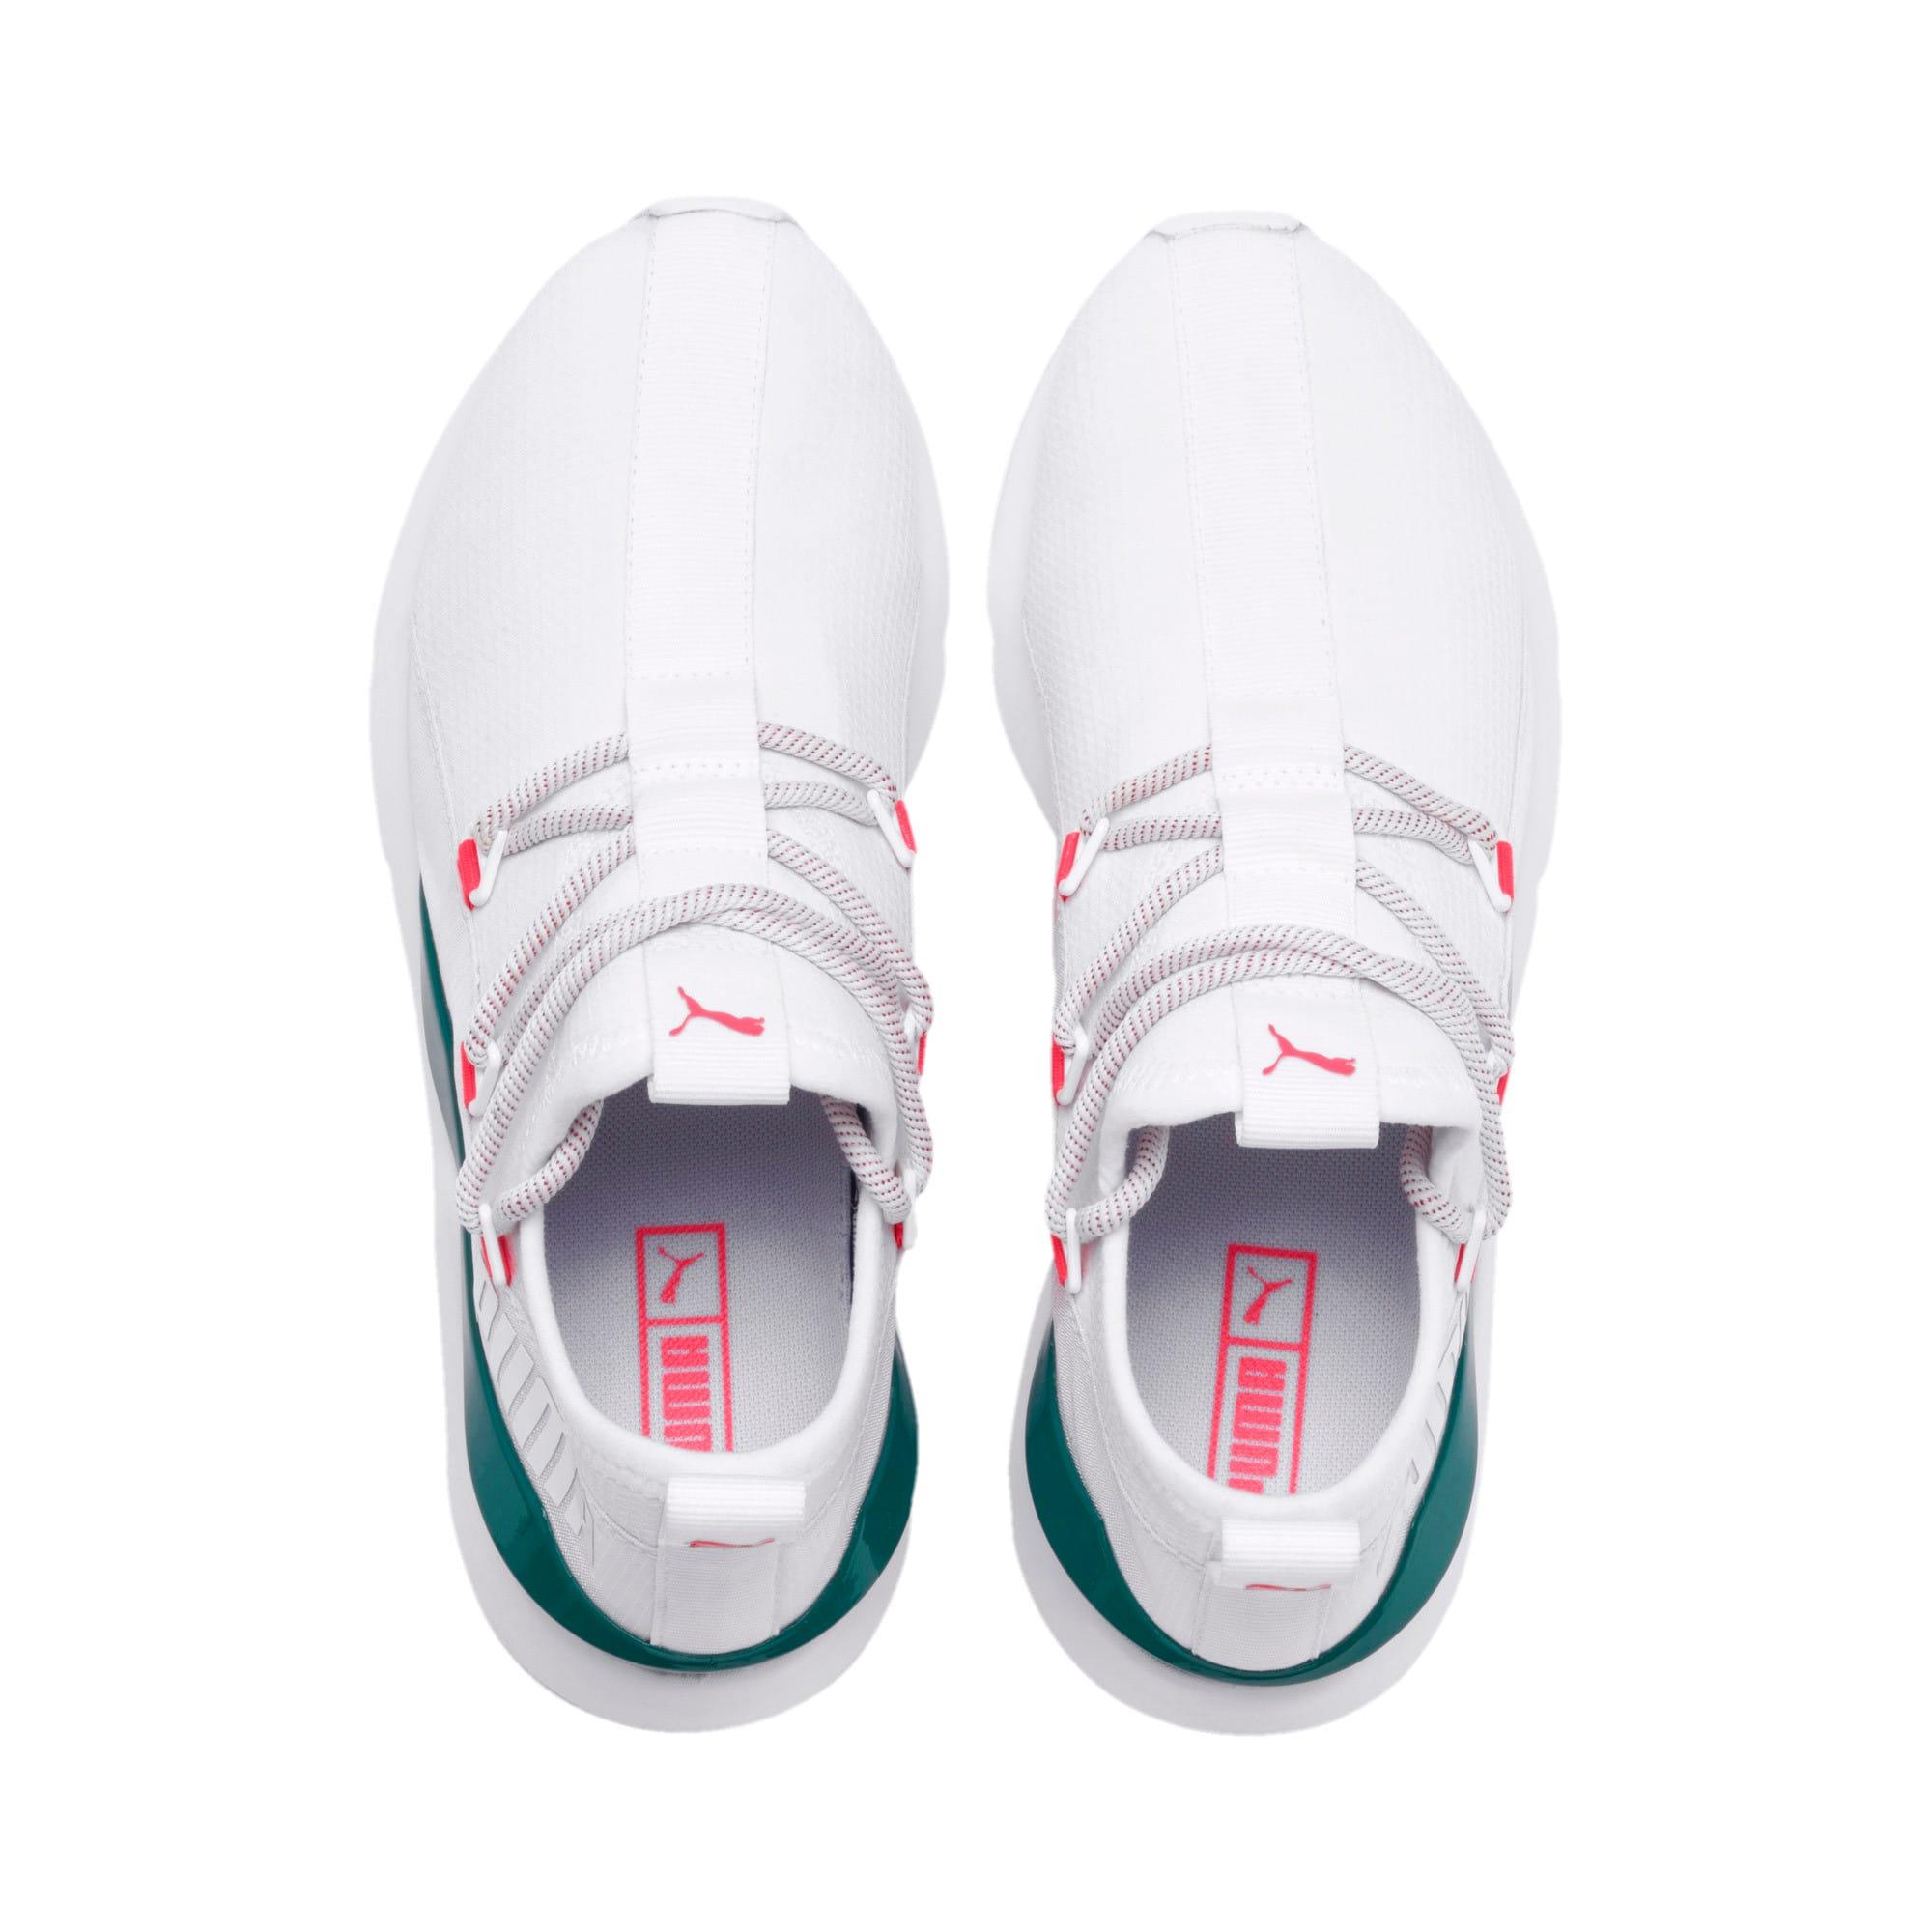 Thumbnail 7 of Muse 2 Hypertech Women's Sneakers, Puma White-Pink Alert, medium